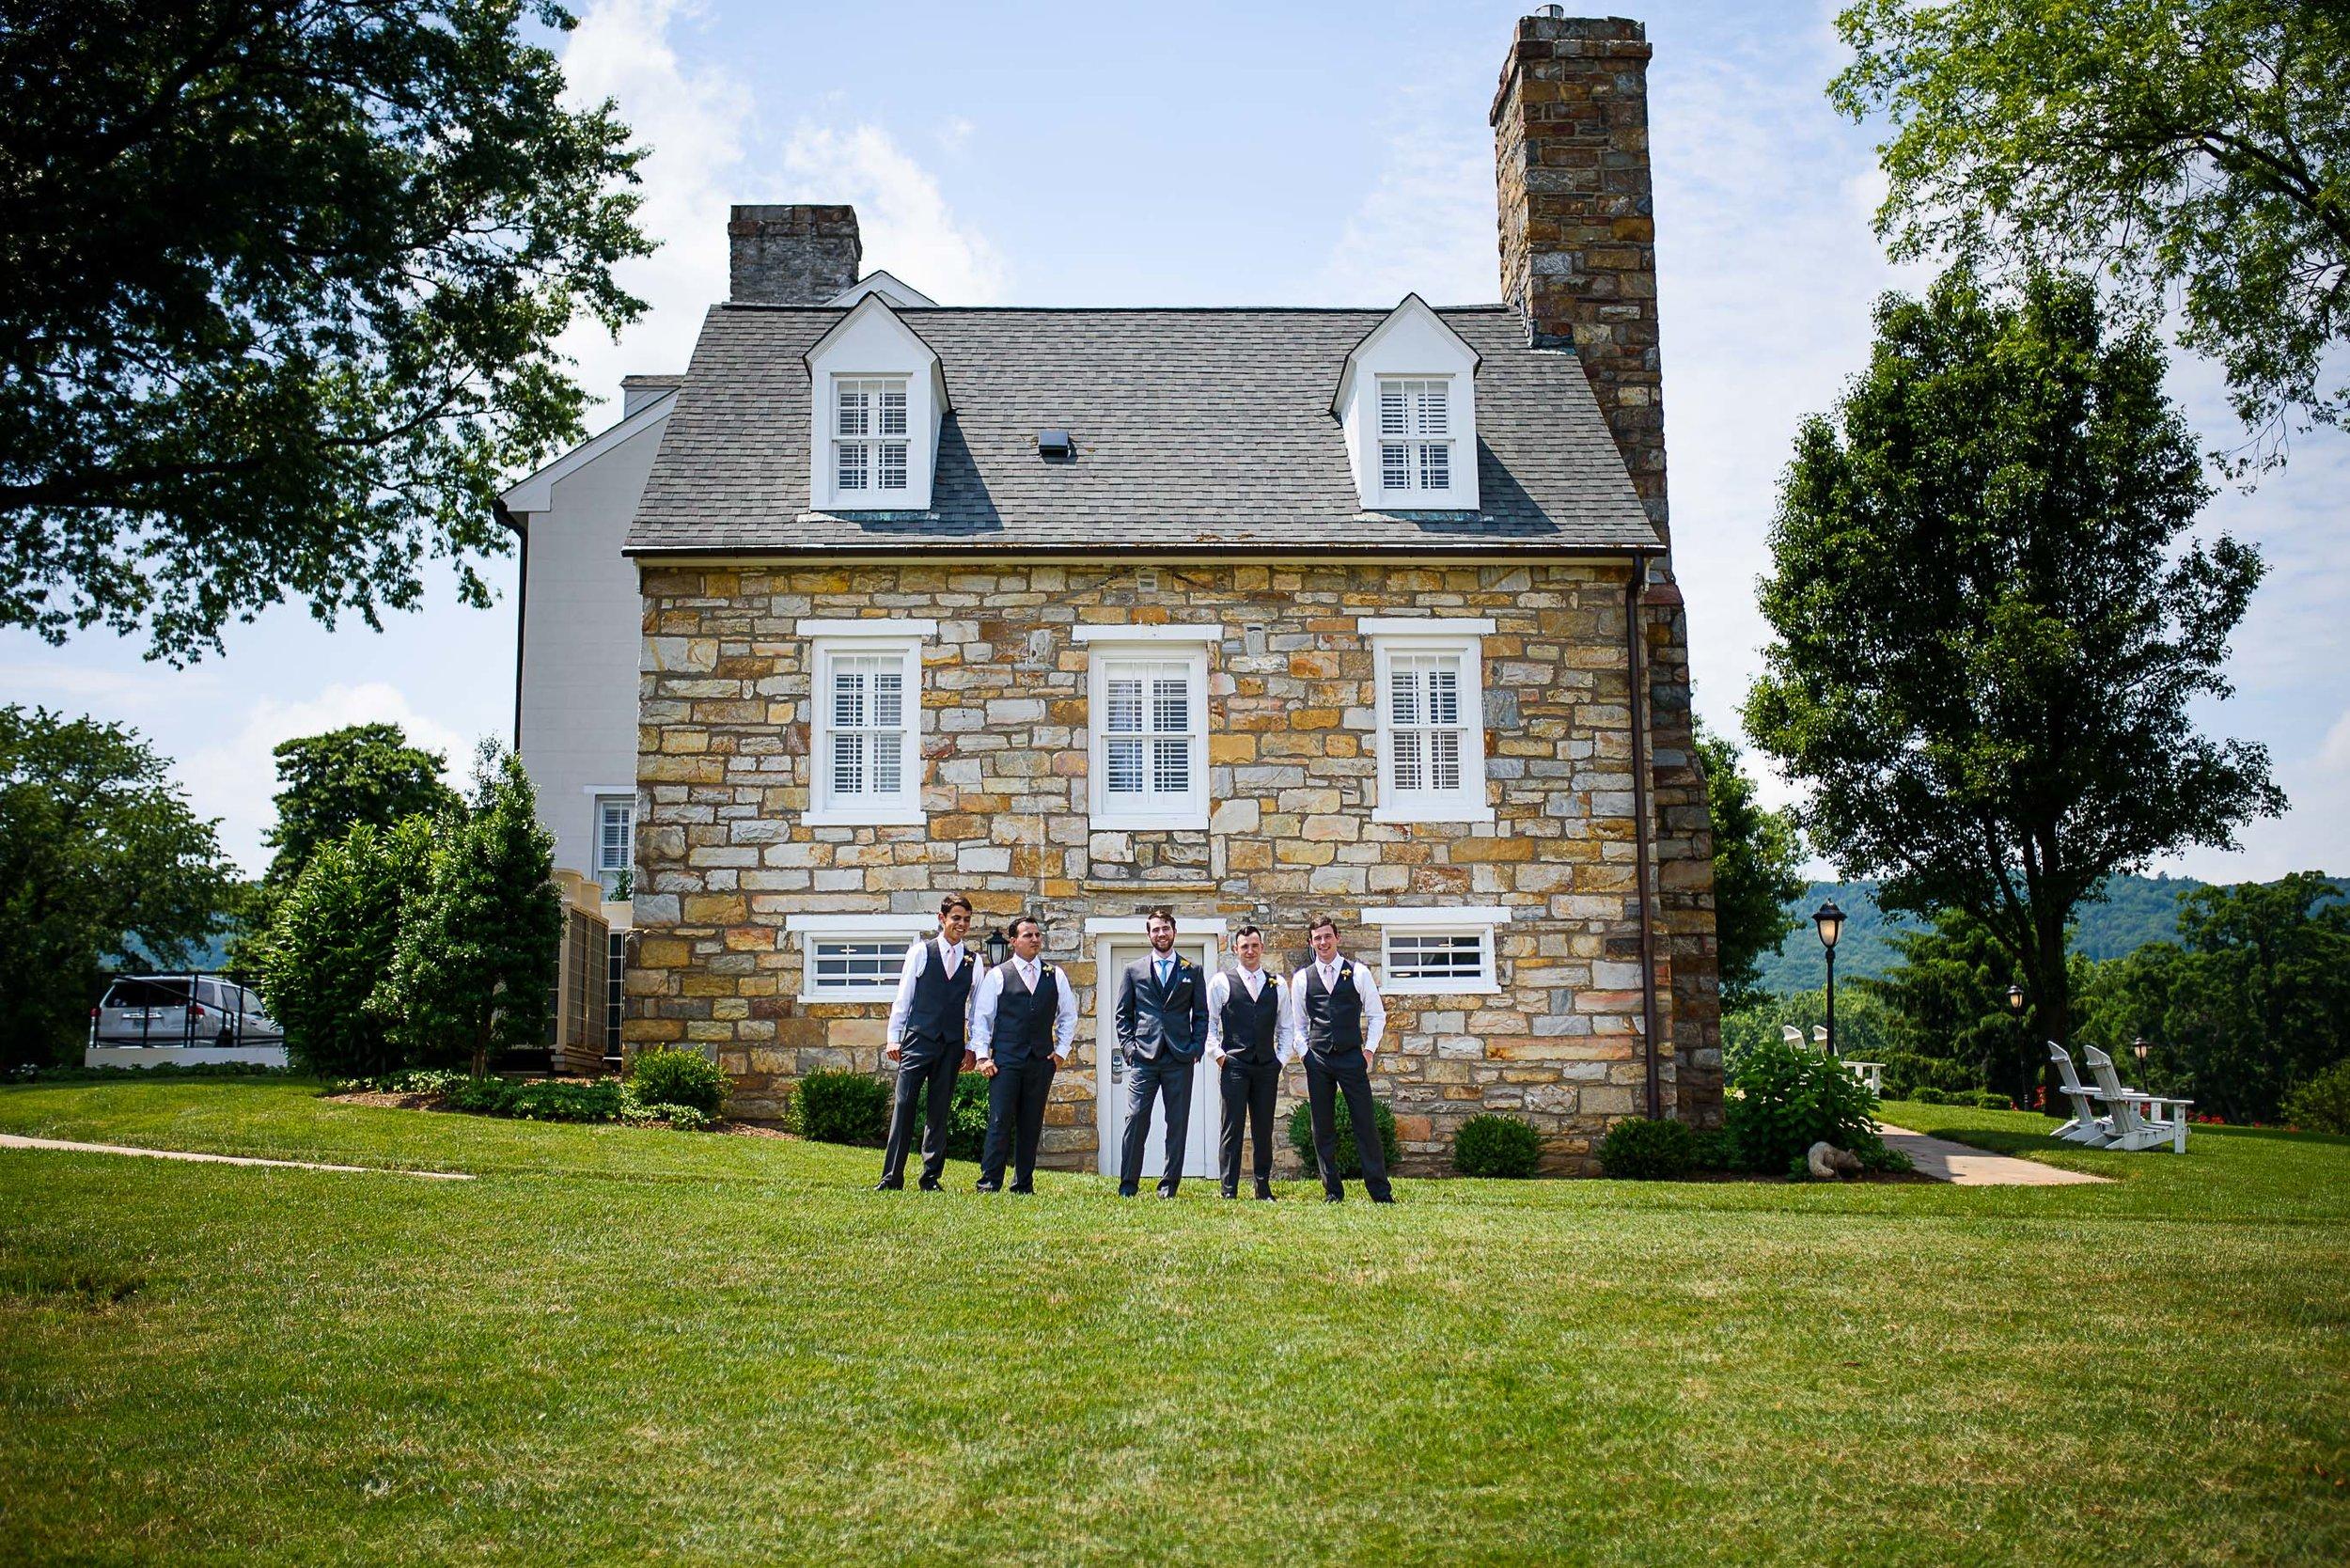 Evergreen Country Club wedding photos12.jpg